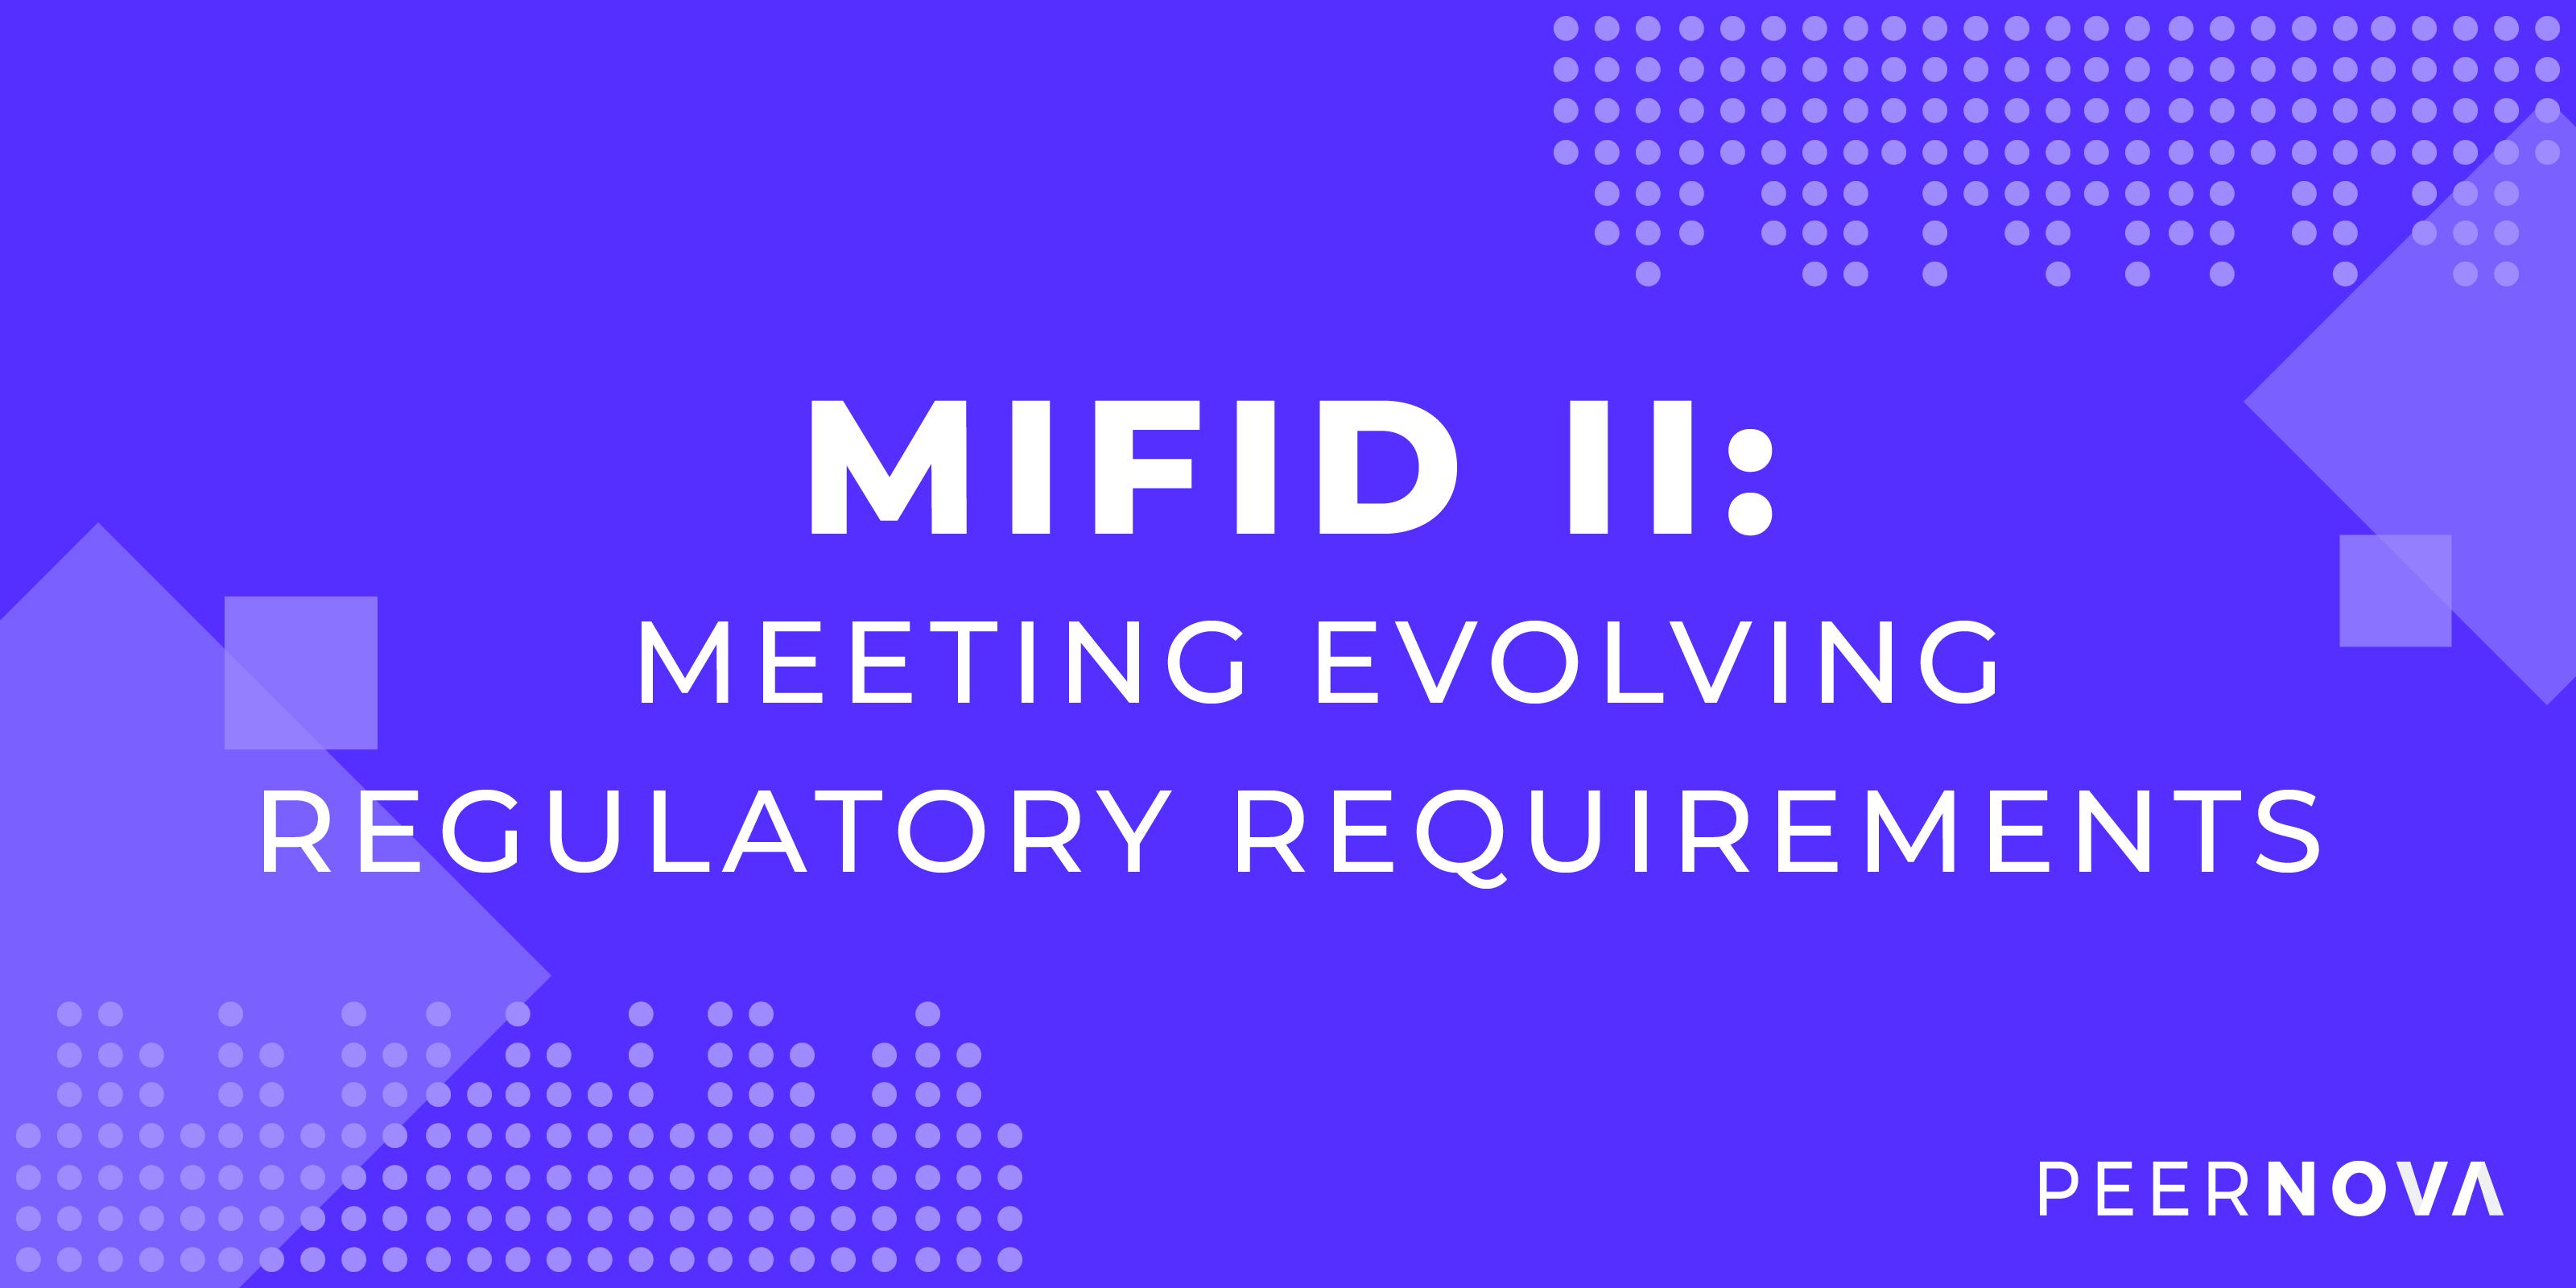 MiFID II: Meeting Evolving Regulatory Requirements with Data Governance